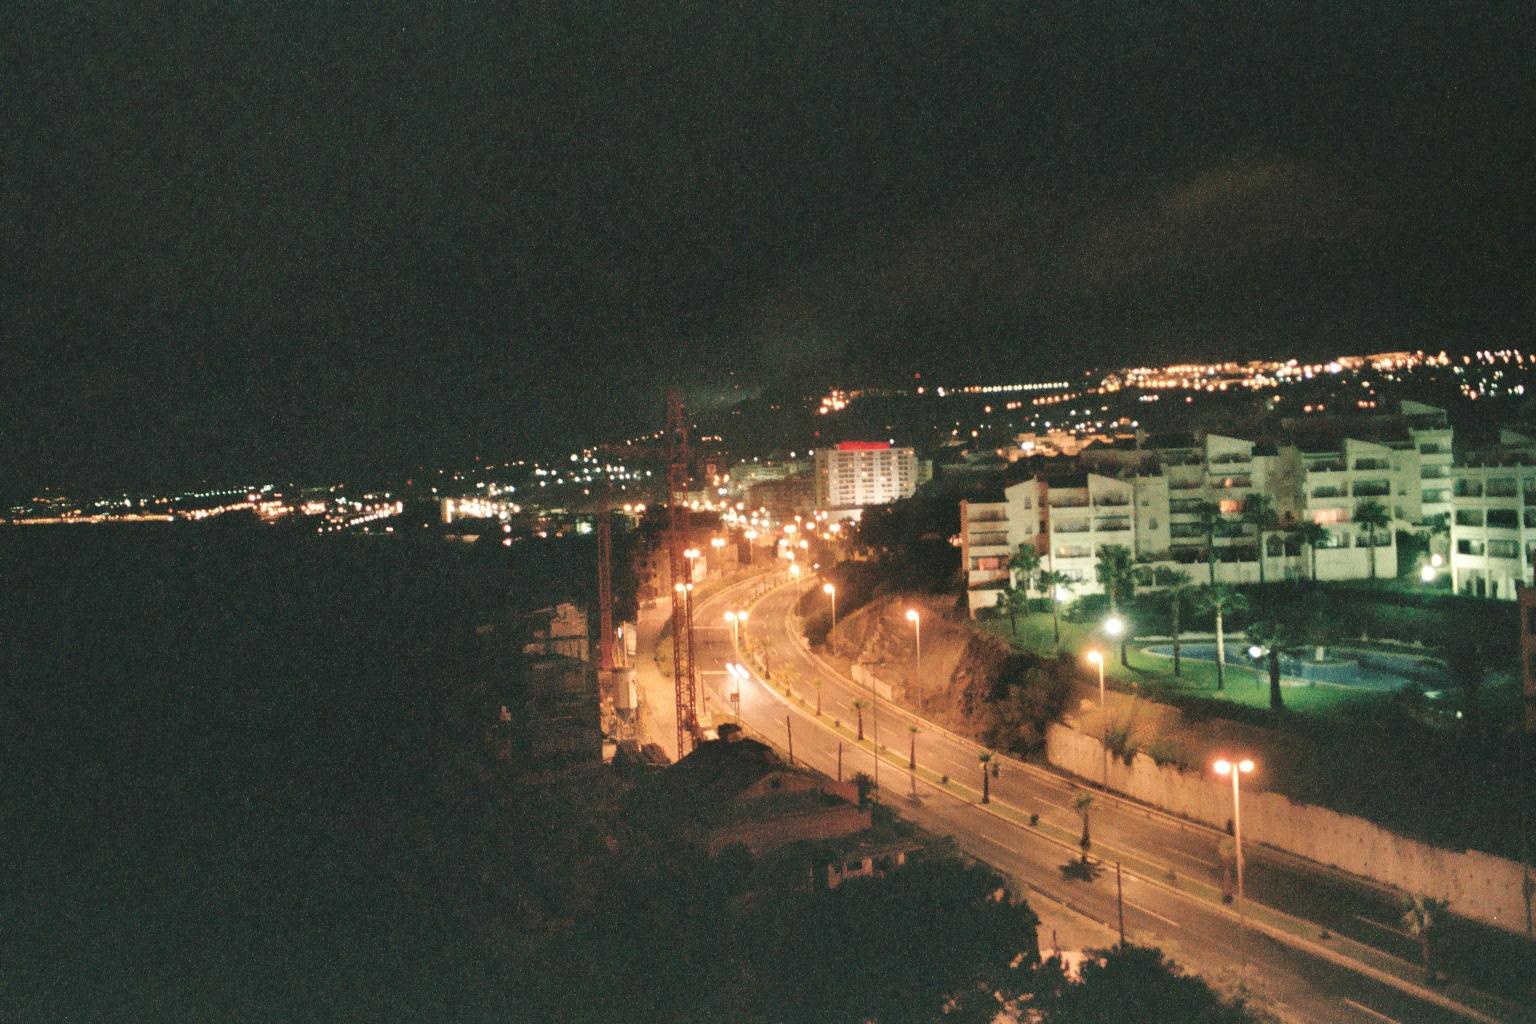 Foto playa Torrequebrada. Spain_Andalusia_Benalmadena by night_22_19A.JPG